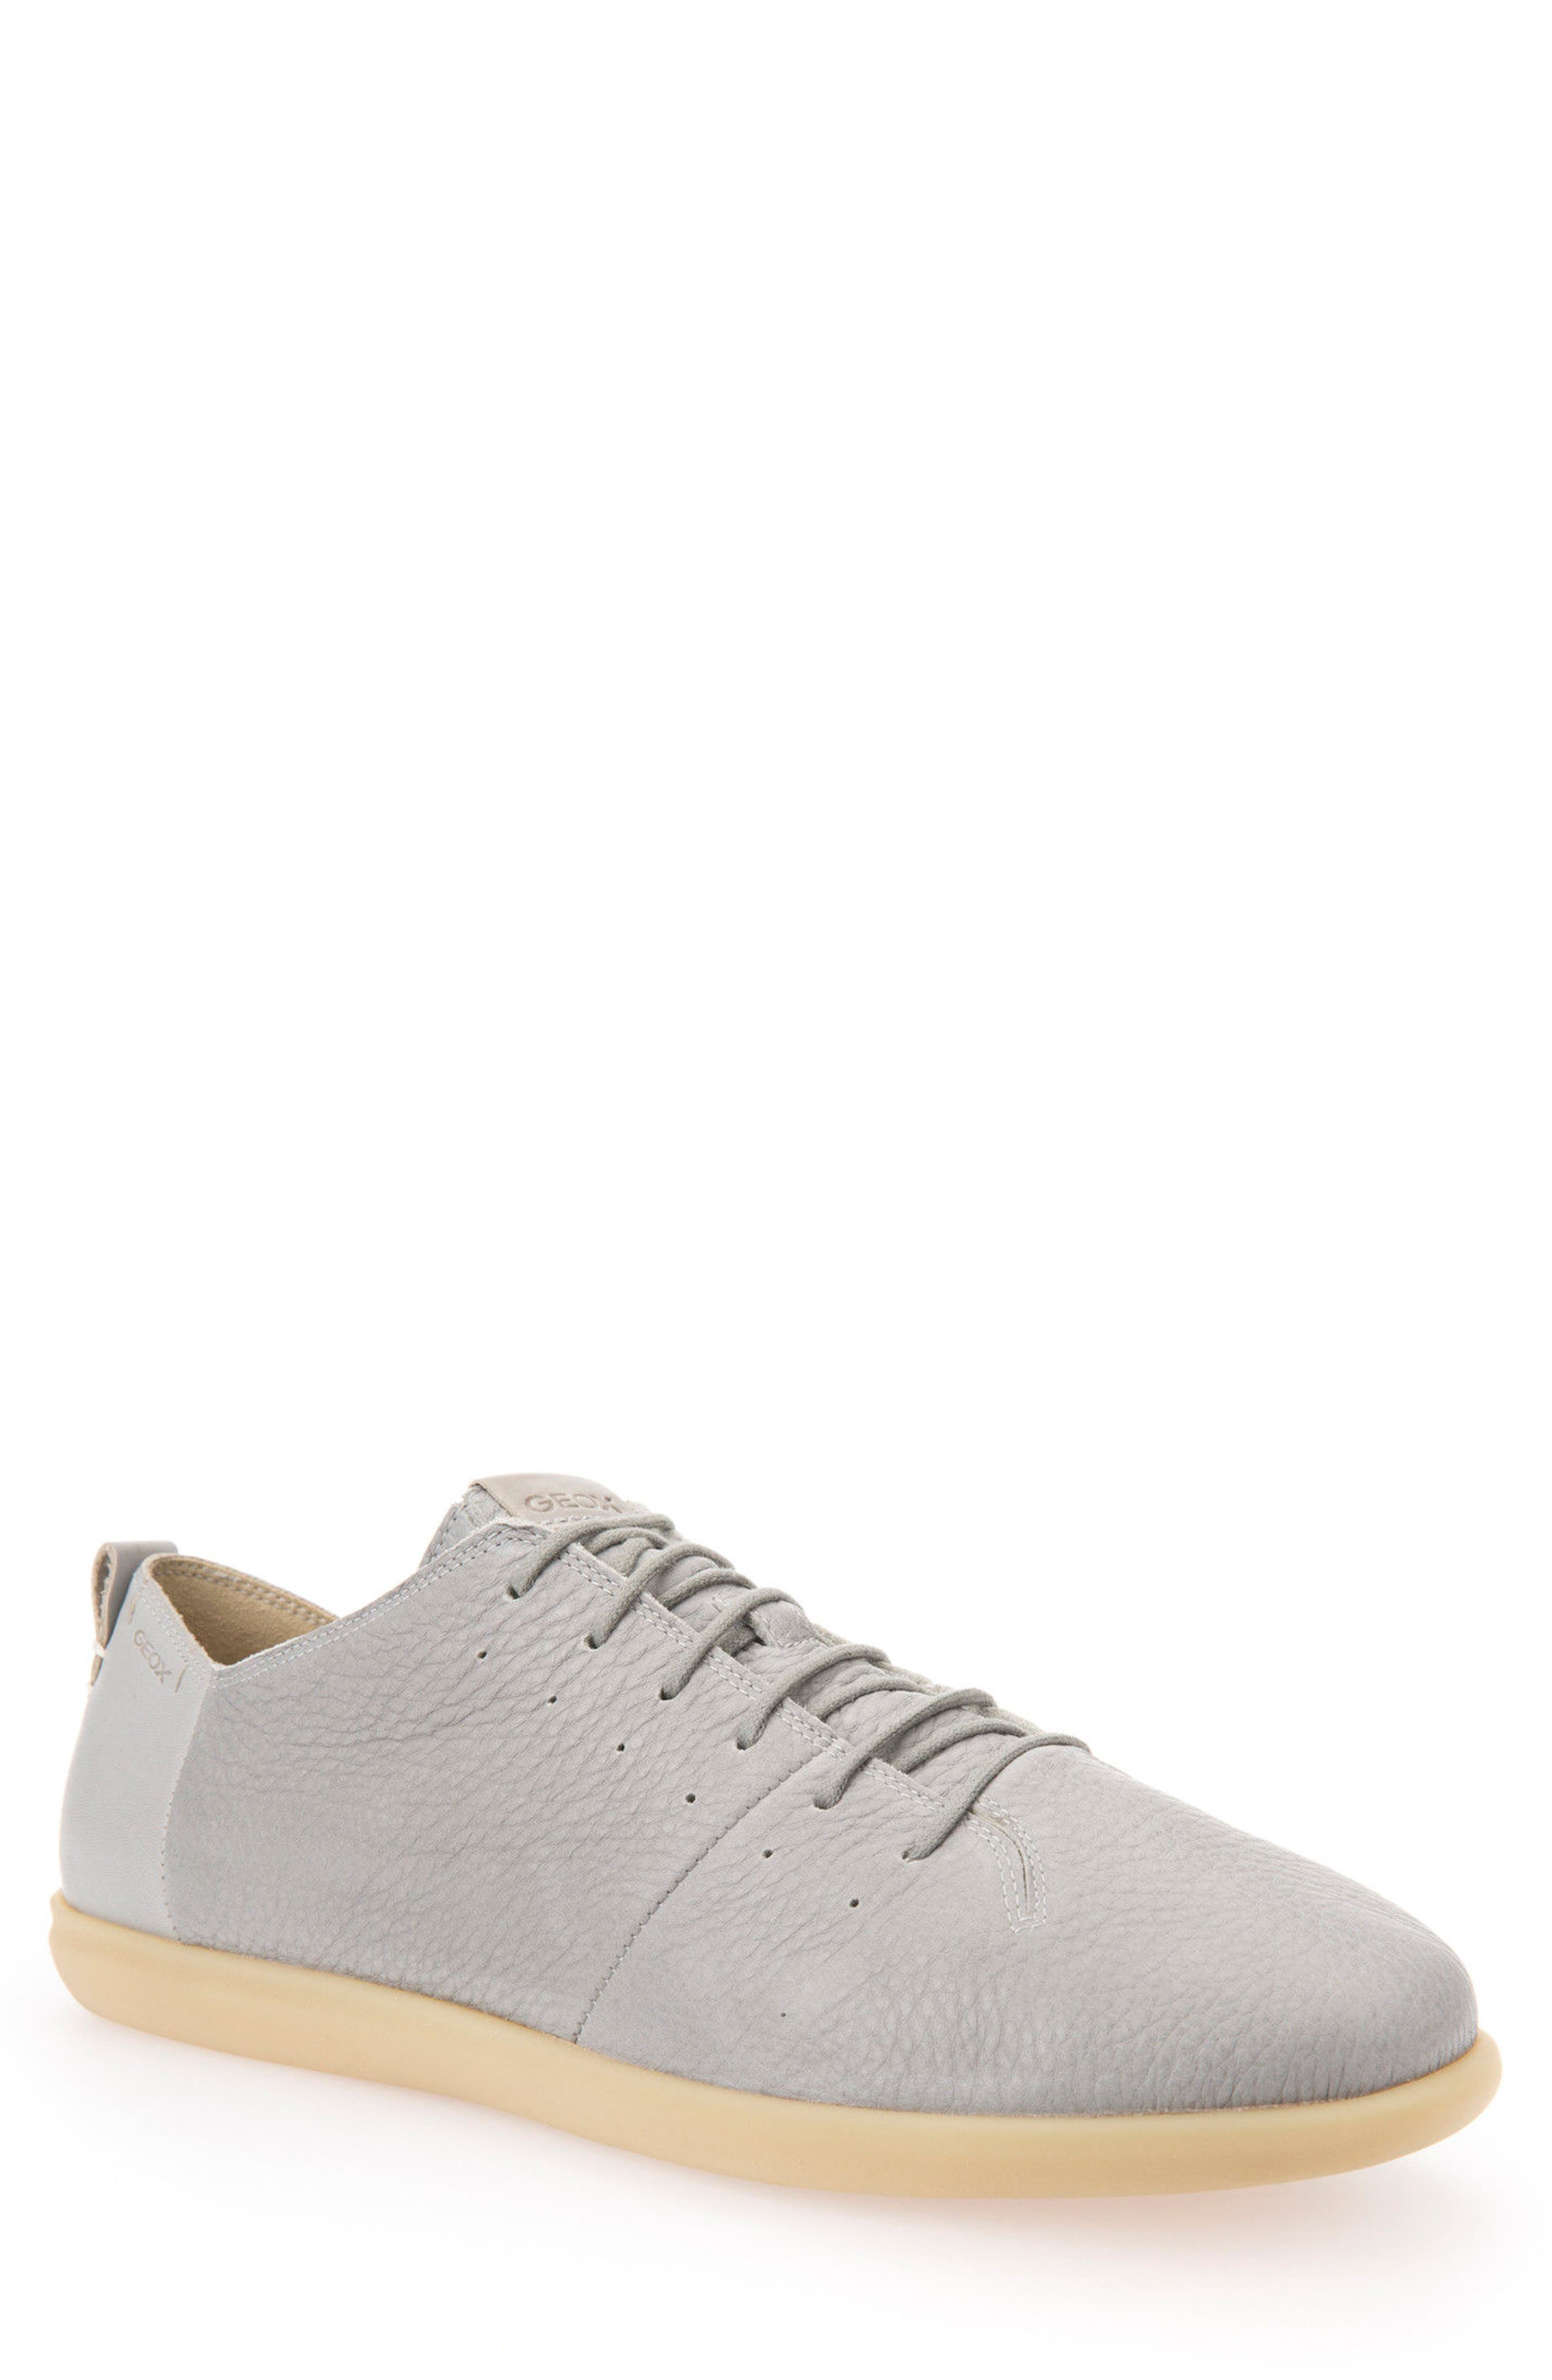 Geox New Do Sneaker (Men)